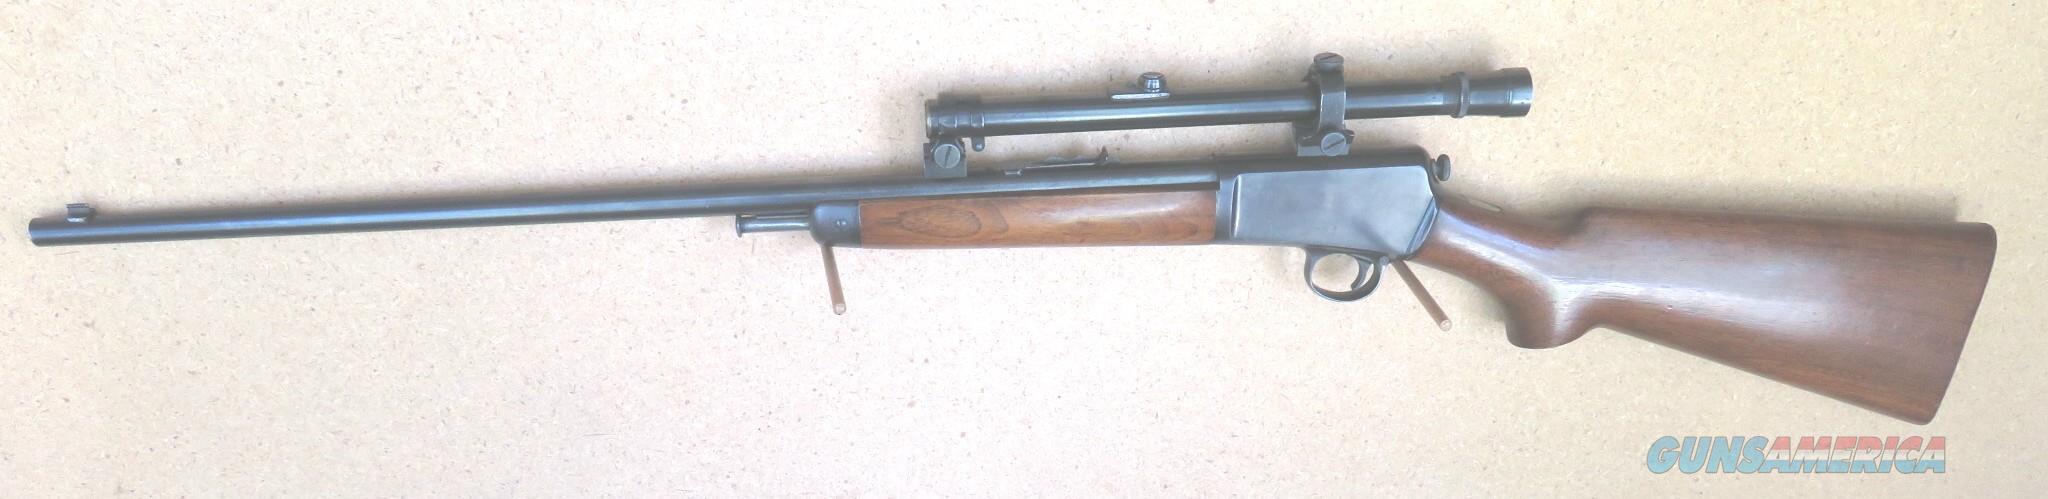 Winchester M-63  Auto .22   Guns > Rifles > Winchester Rifles - Modern Bolt/Auto/Single > Autoloaders